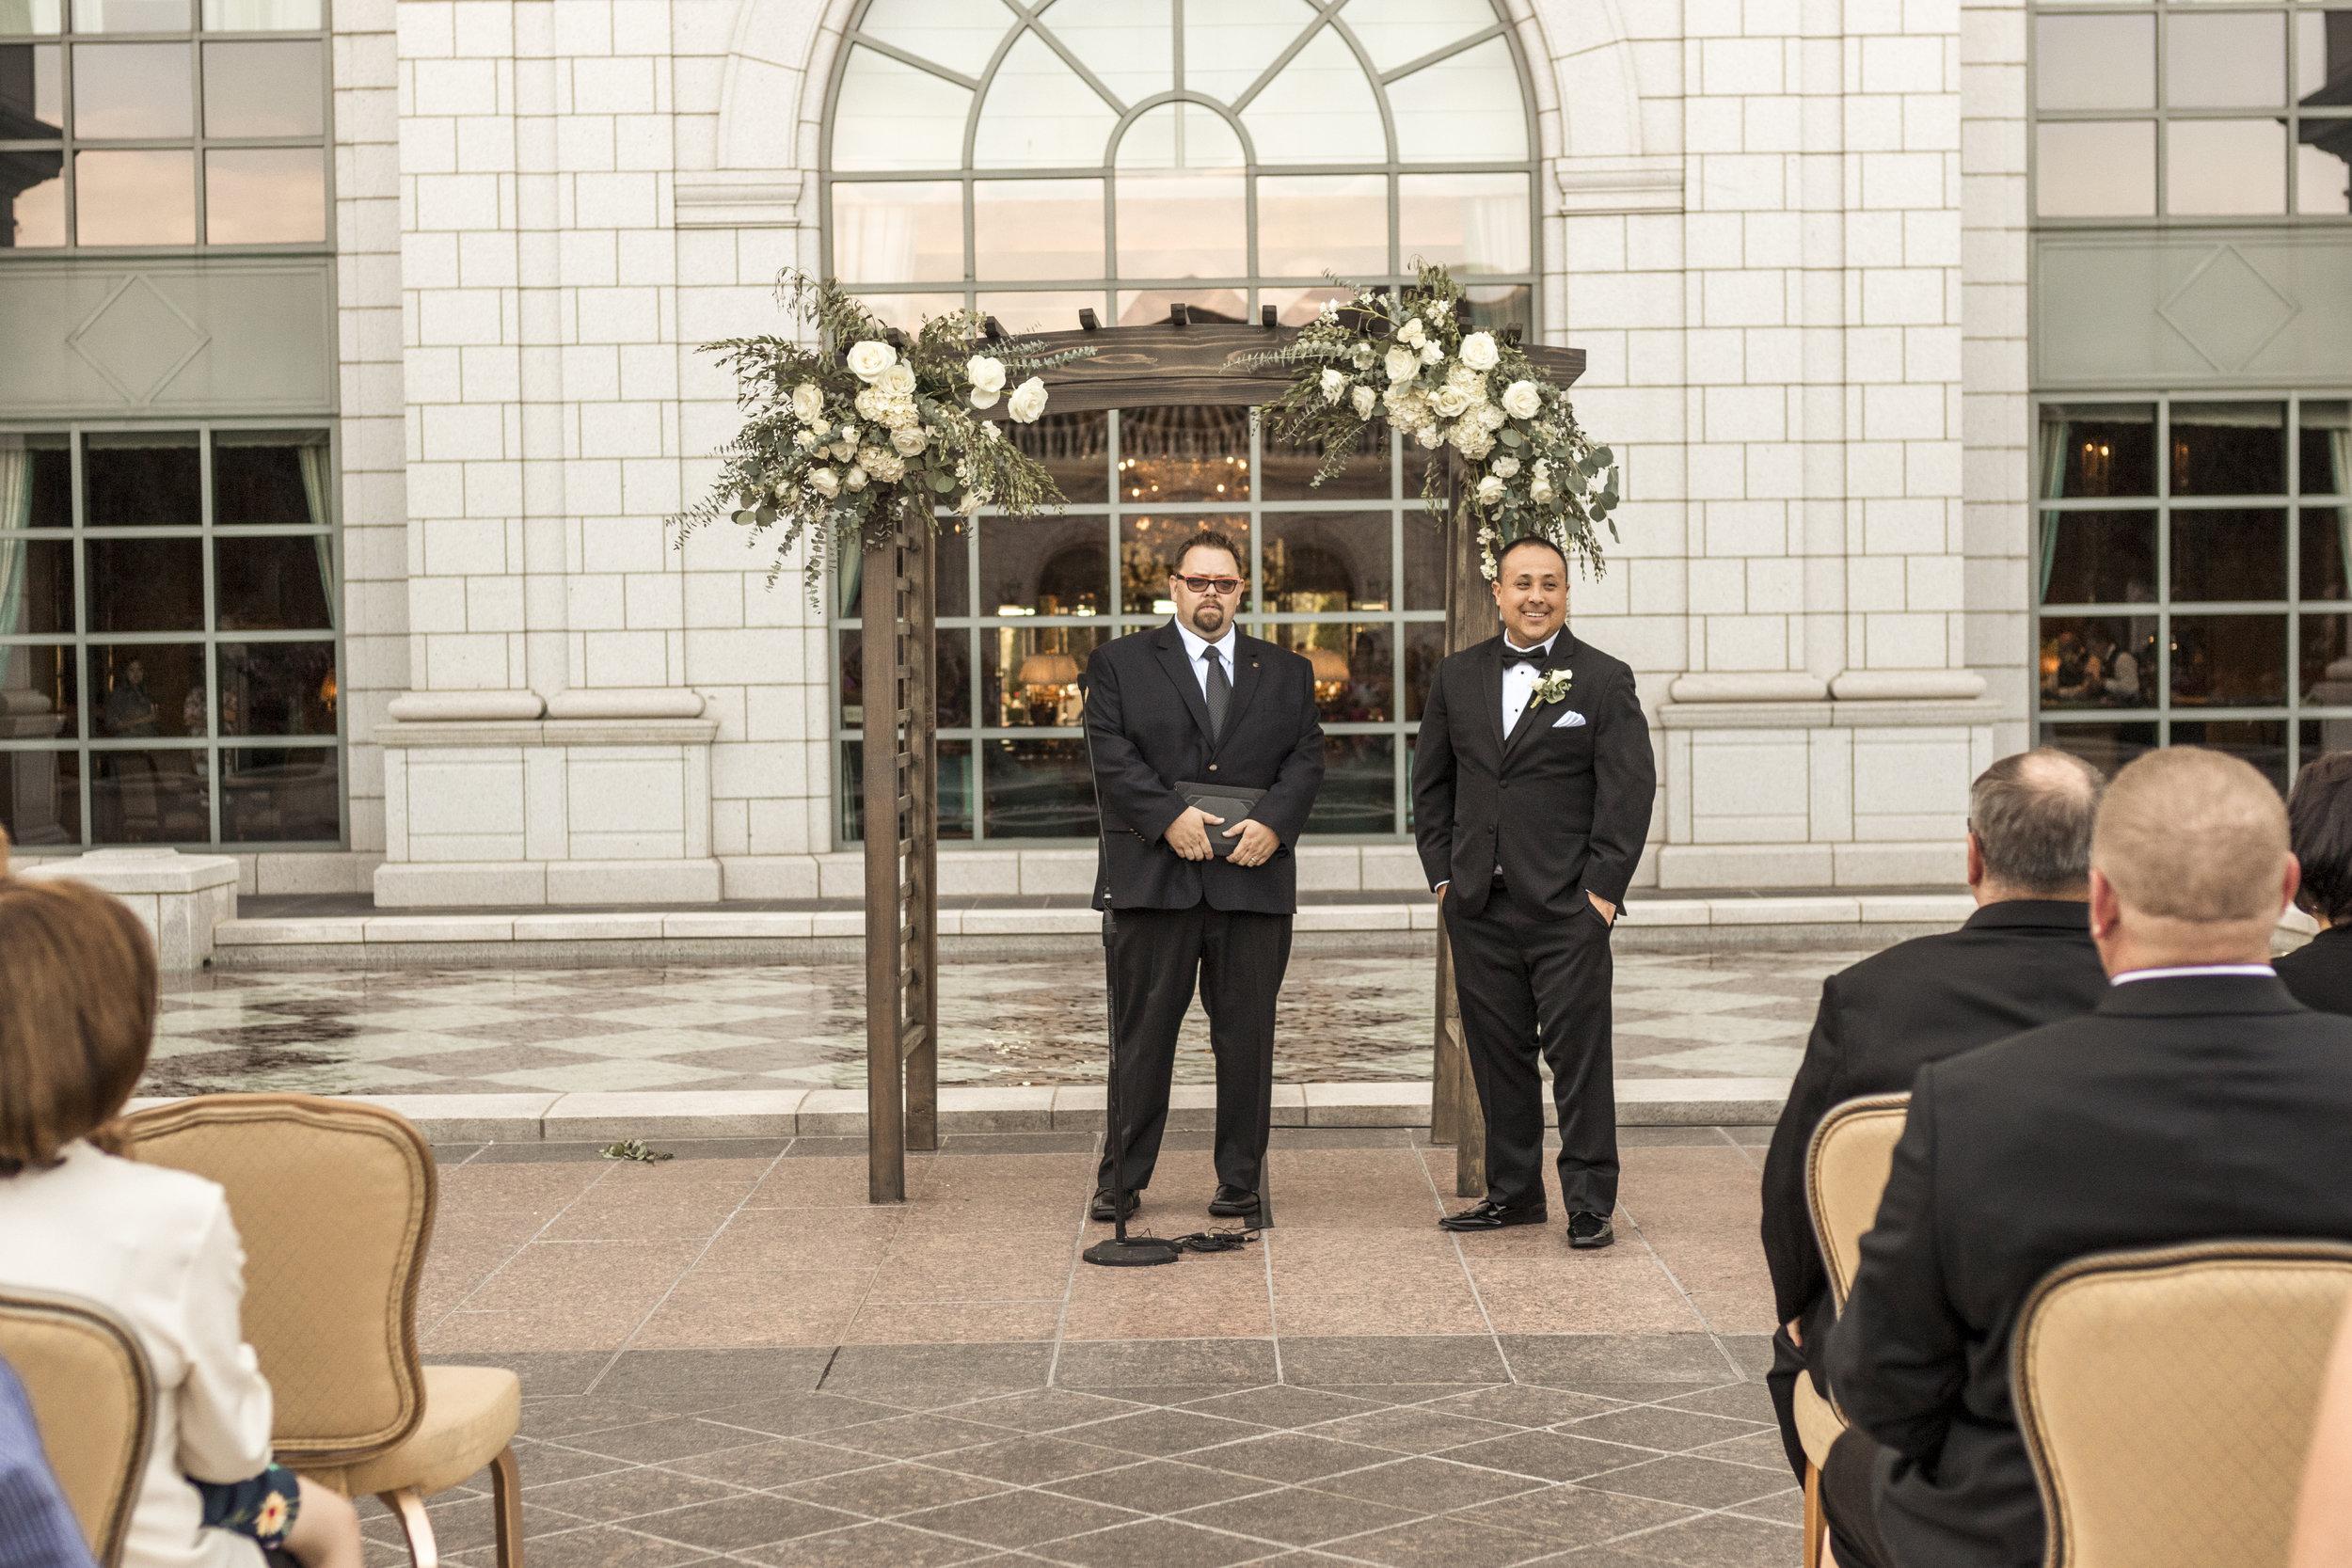 Grand America Hotel High End Wedding  Salt Lake City, Utah   Bri Bergman Photography 017.JPG